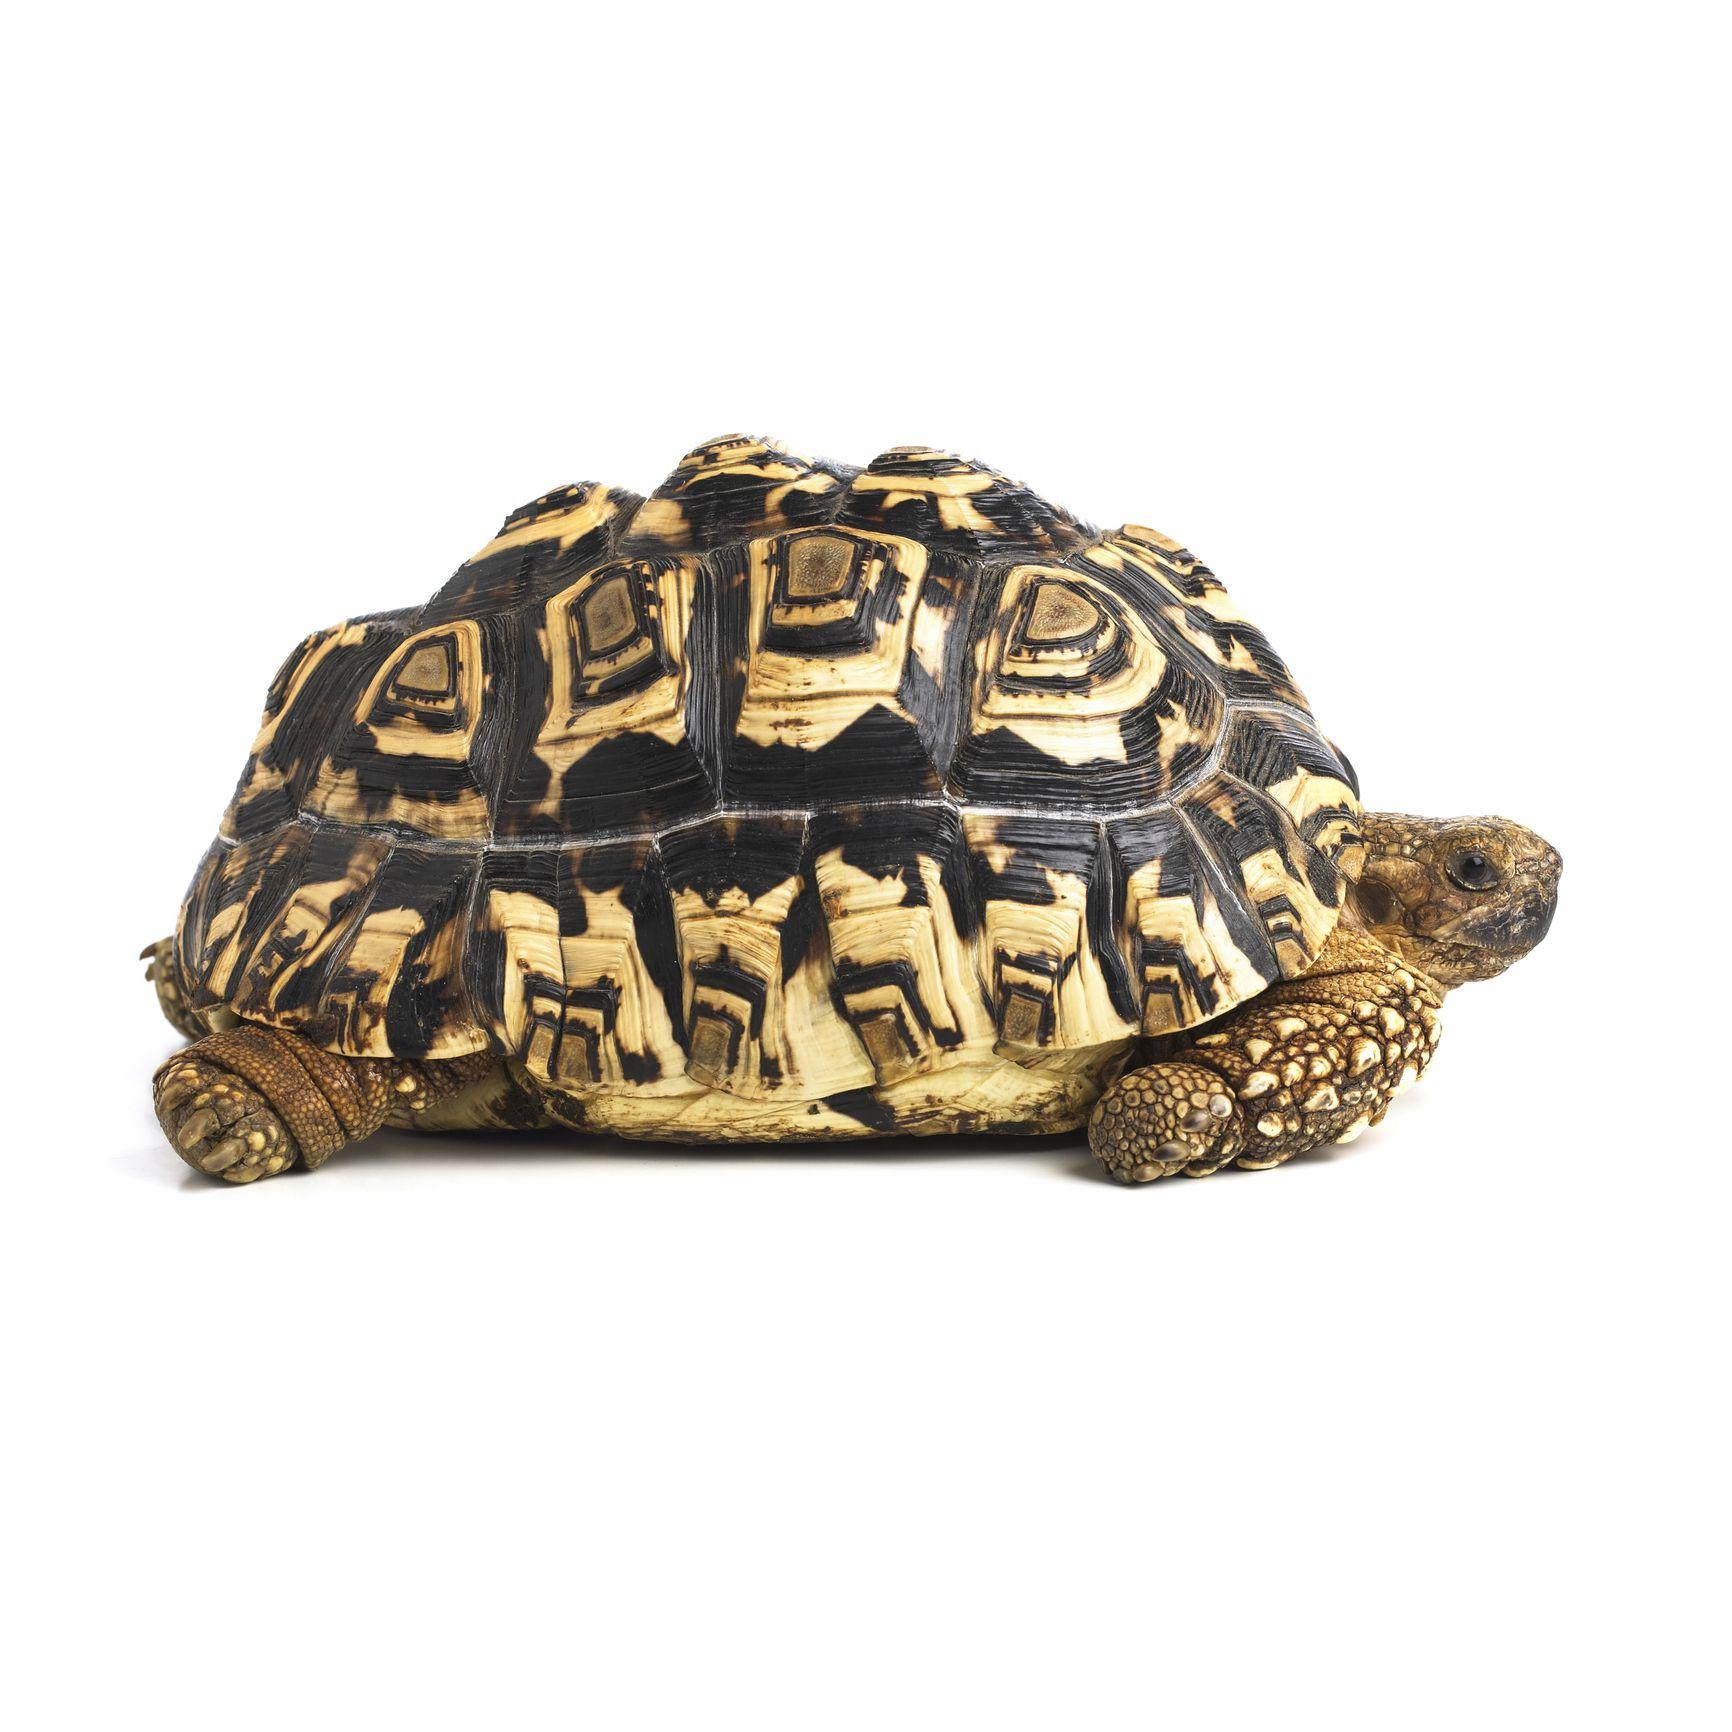 Housing tortoises indoors building custom enclosures do leopard tortoises make good pets solutioingenieria Choice Image